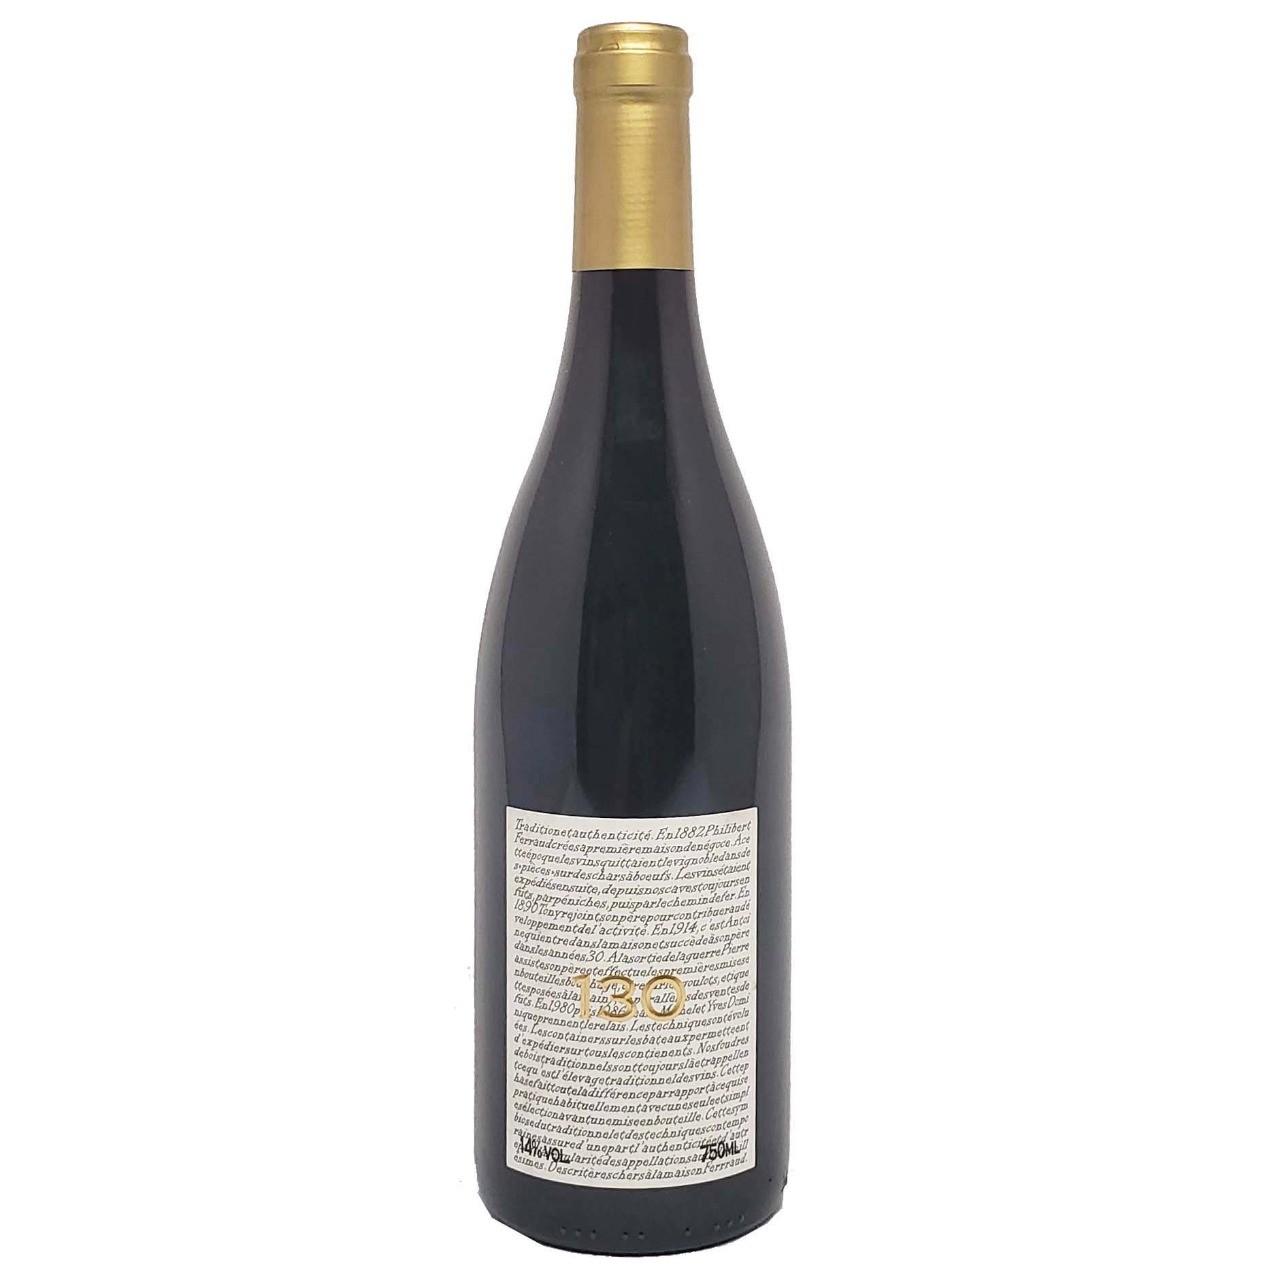 Vinho Tinto Cuvée 130 AOC Saint Amour P. Ferraud & Fils - 750ml -